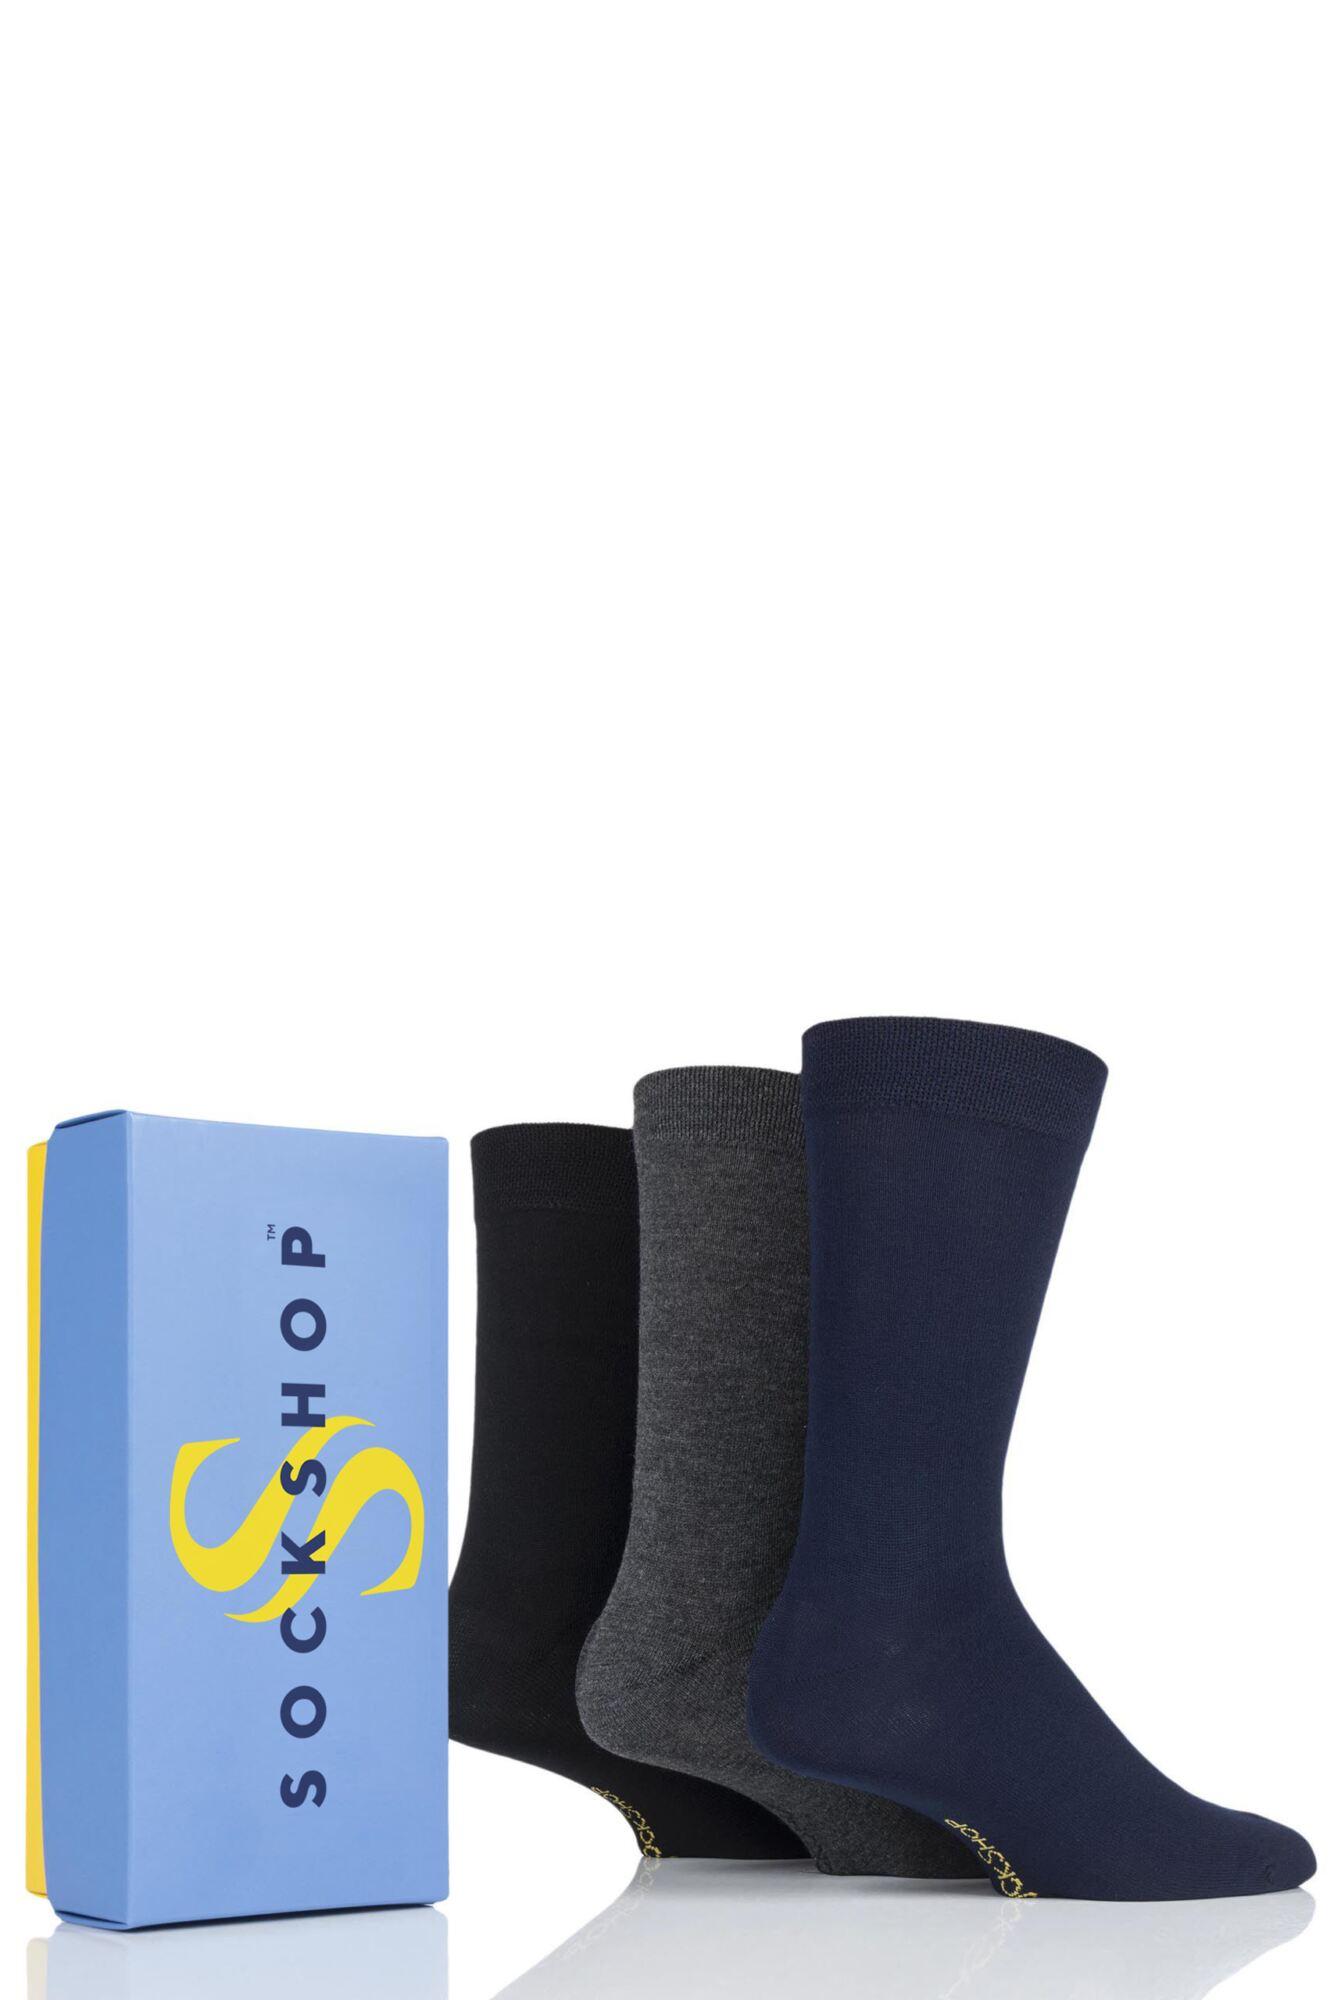 3 Pair Bamboo Bright Gift Boxed Socks Men's - SOCKSHOP